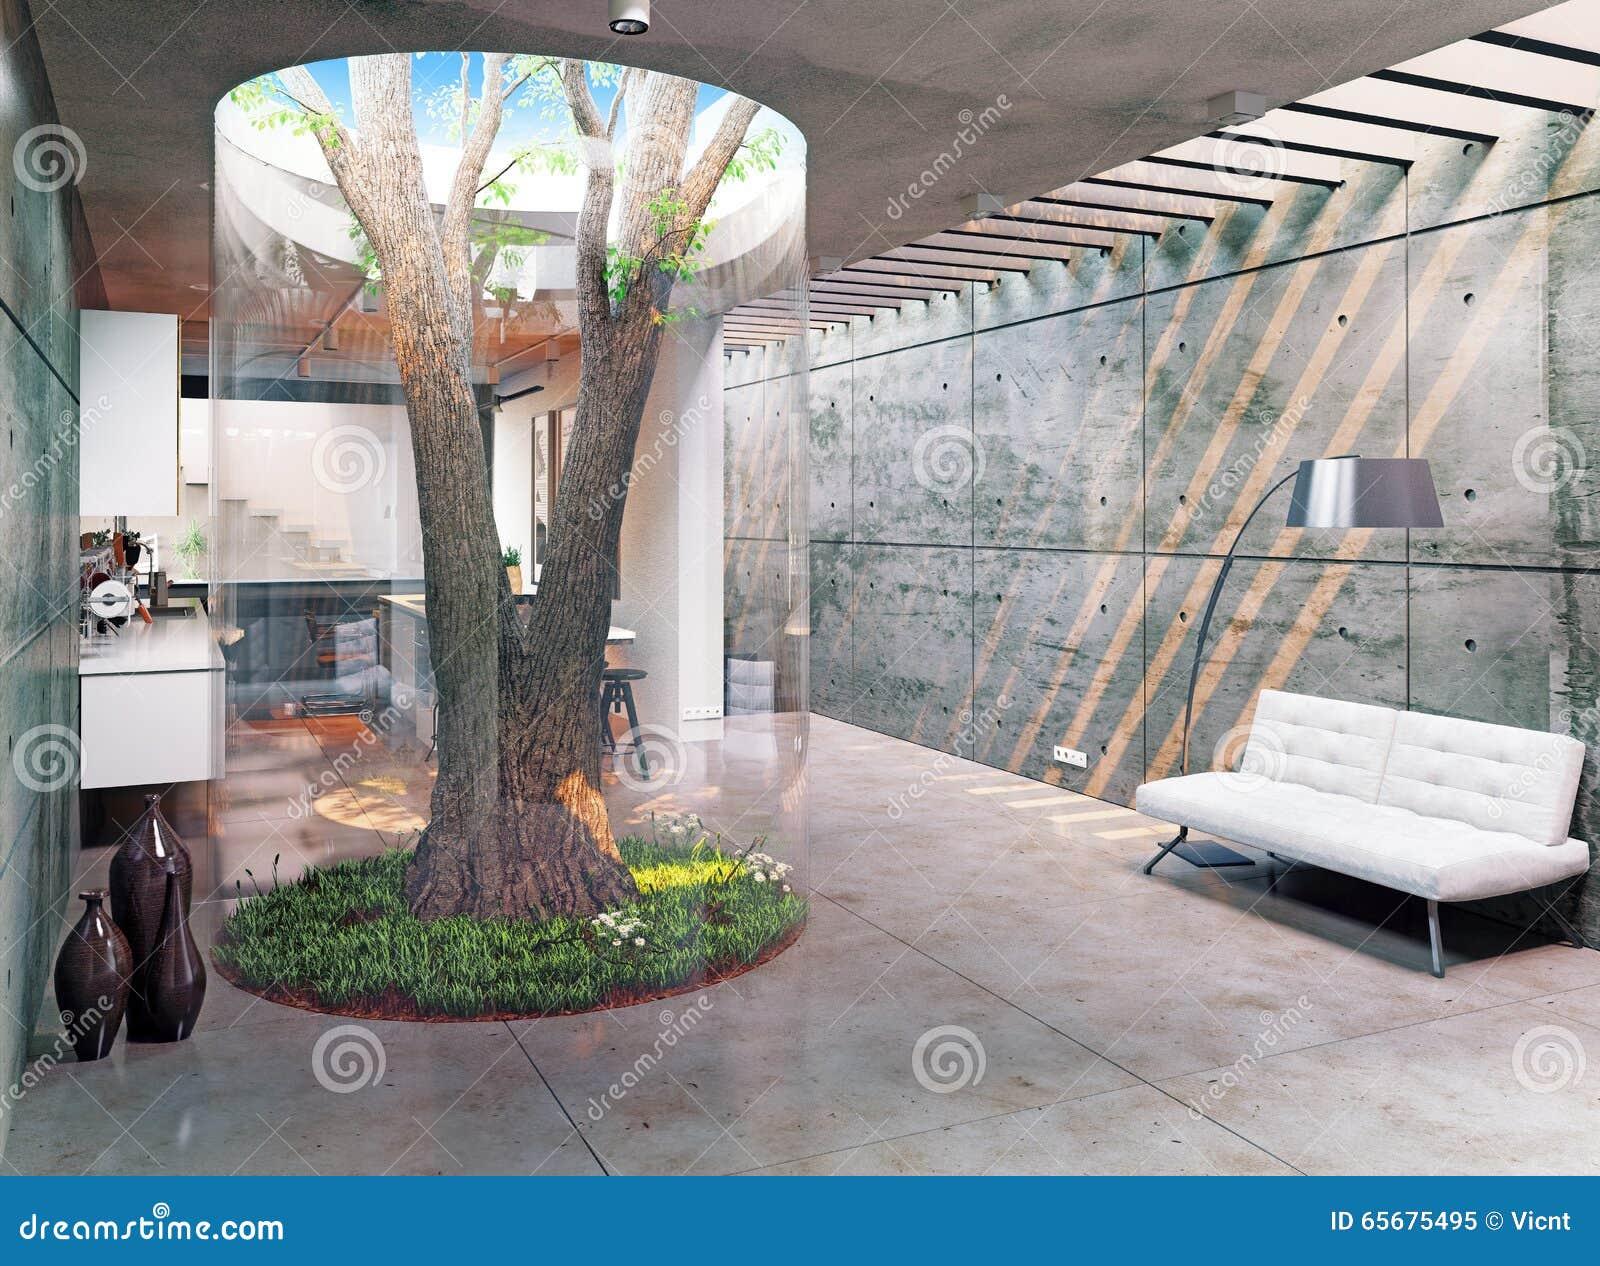 Modern house interior stock illustration image 65675495 for Modern concept interior design house